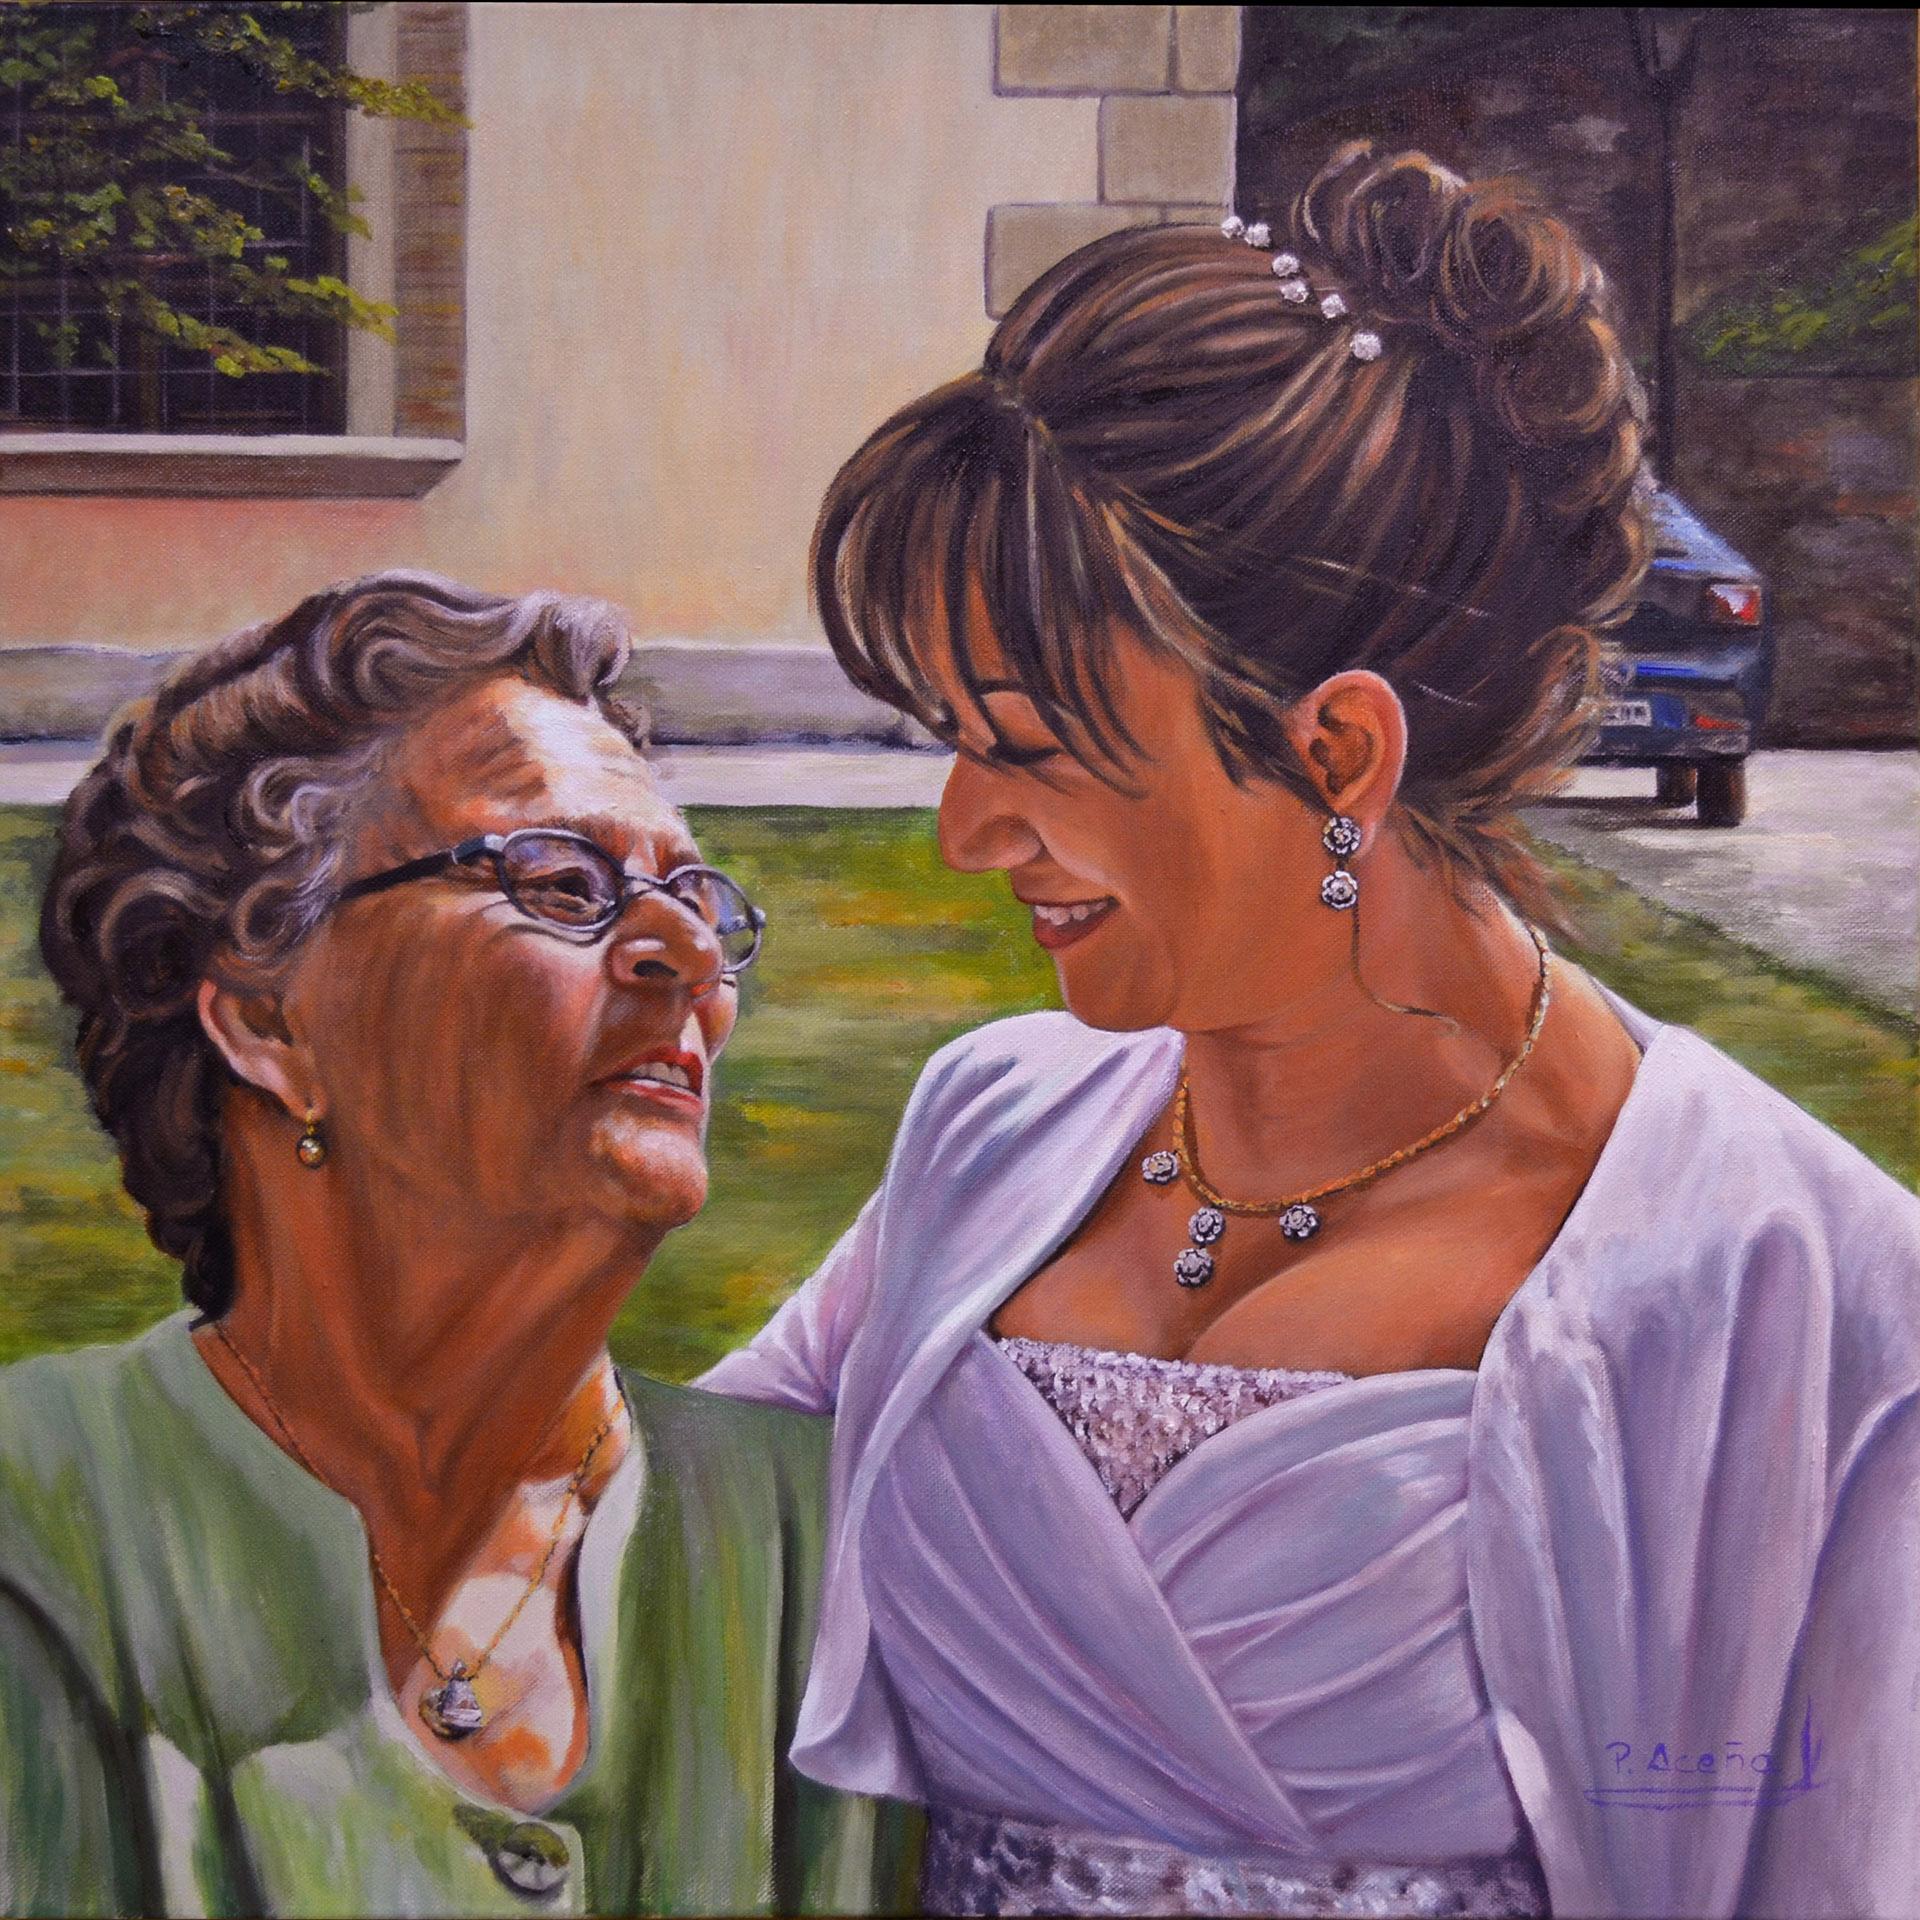 Mamá y yo. Obra de Pilar Aceña, óleo sobre lienzo, 60 x 60 cm. 2012